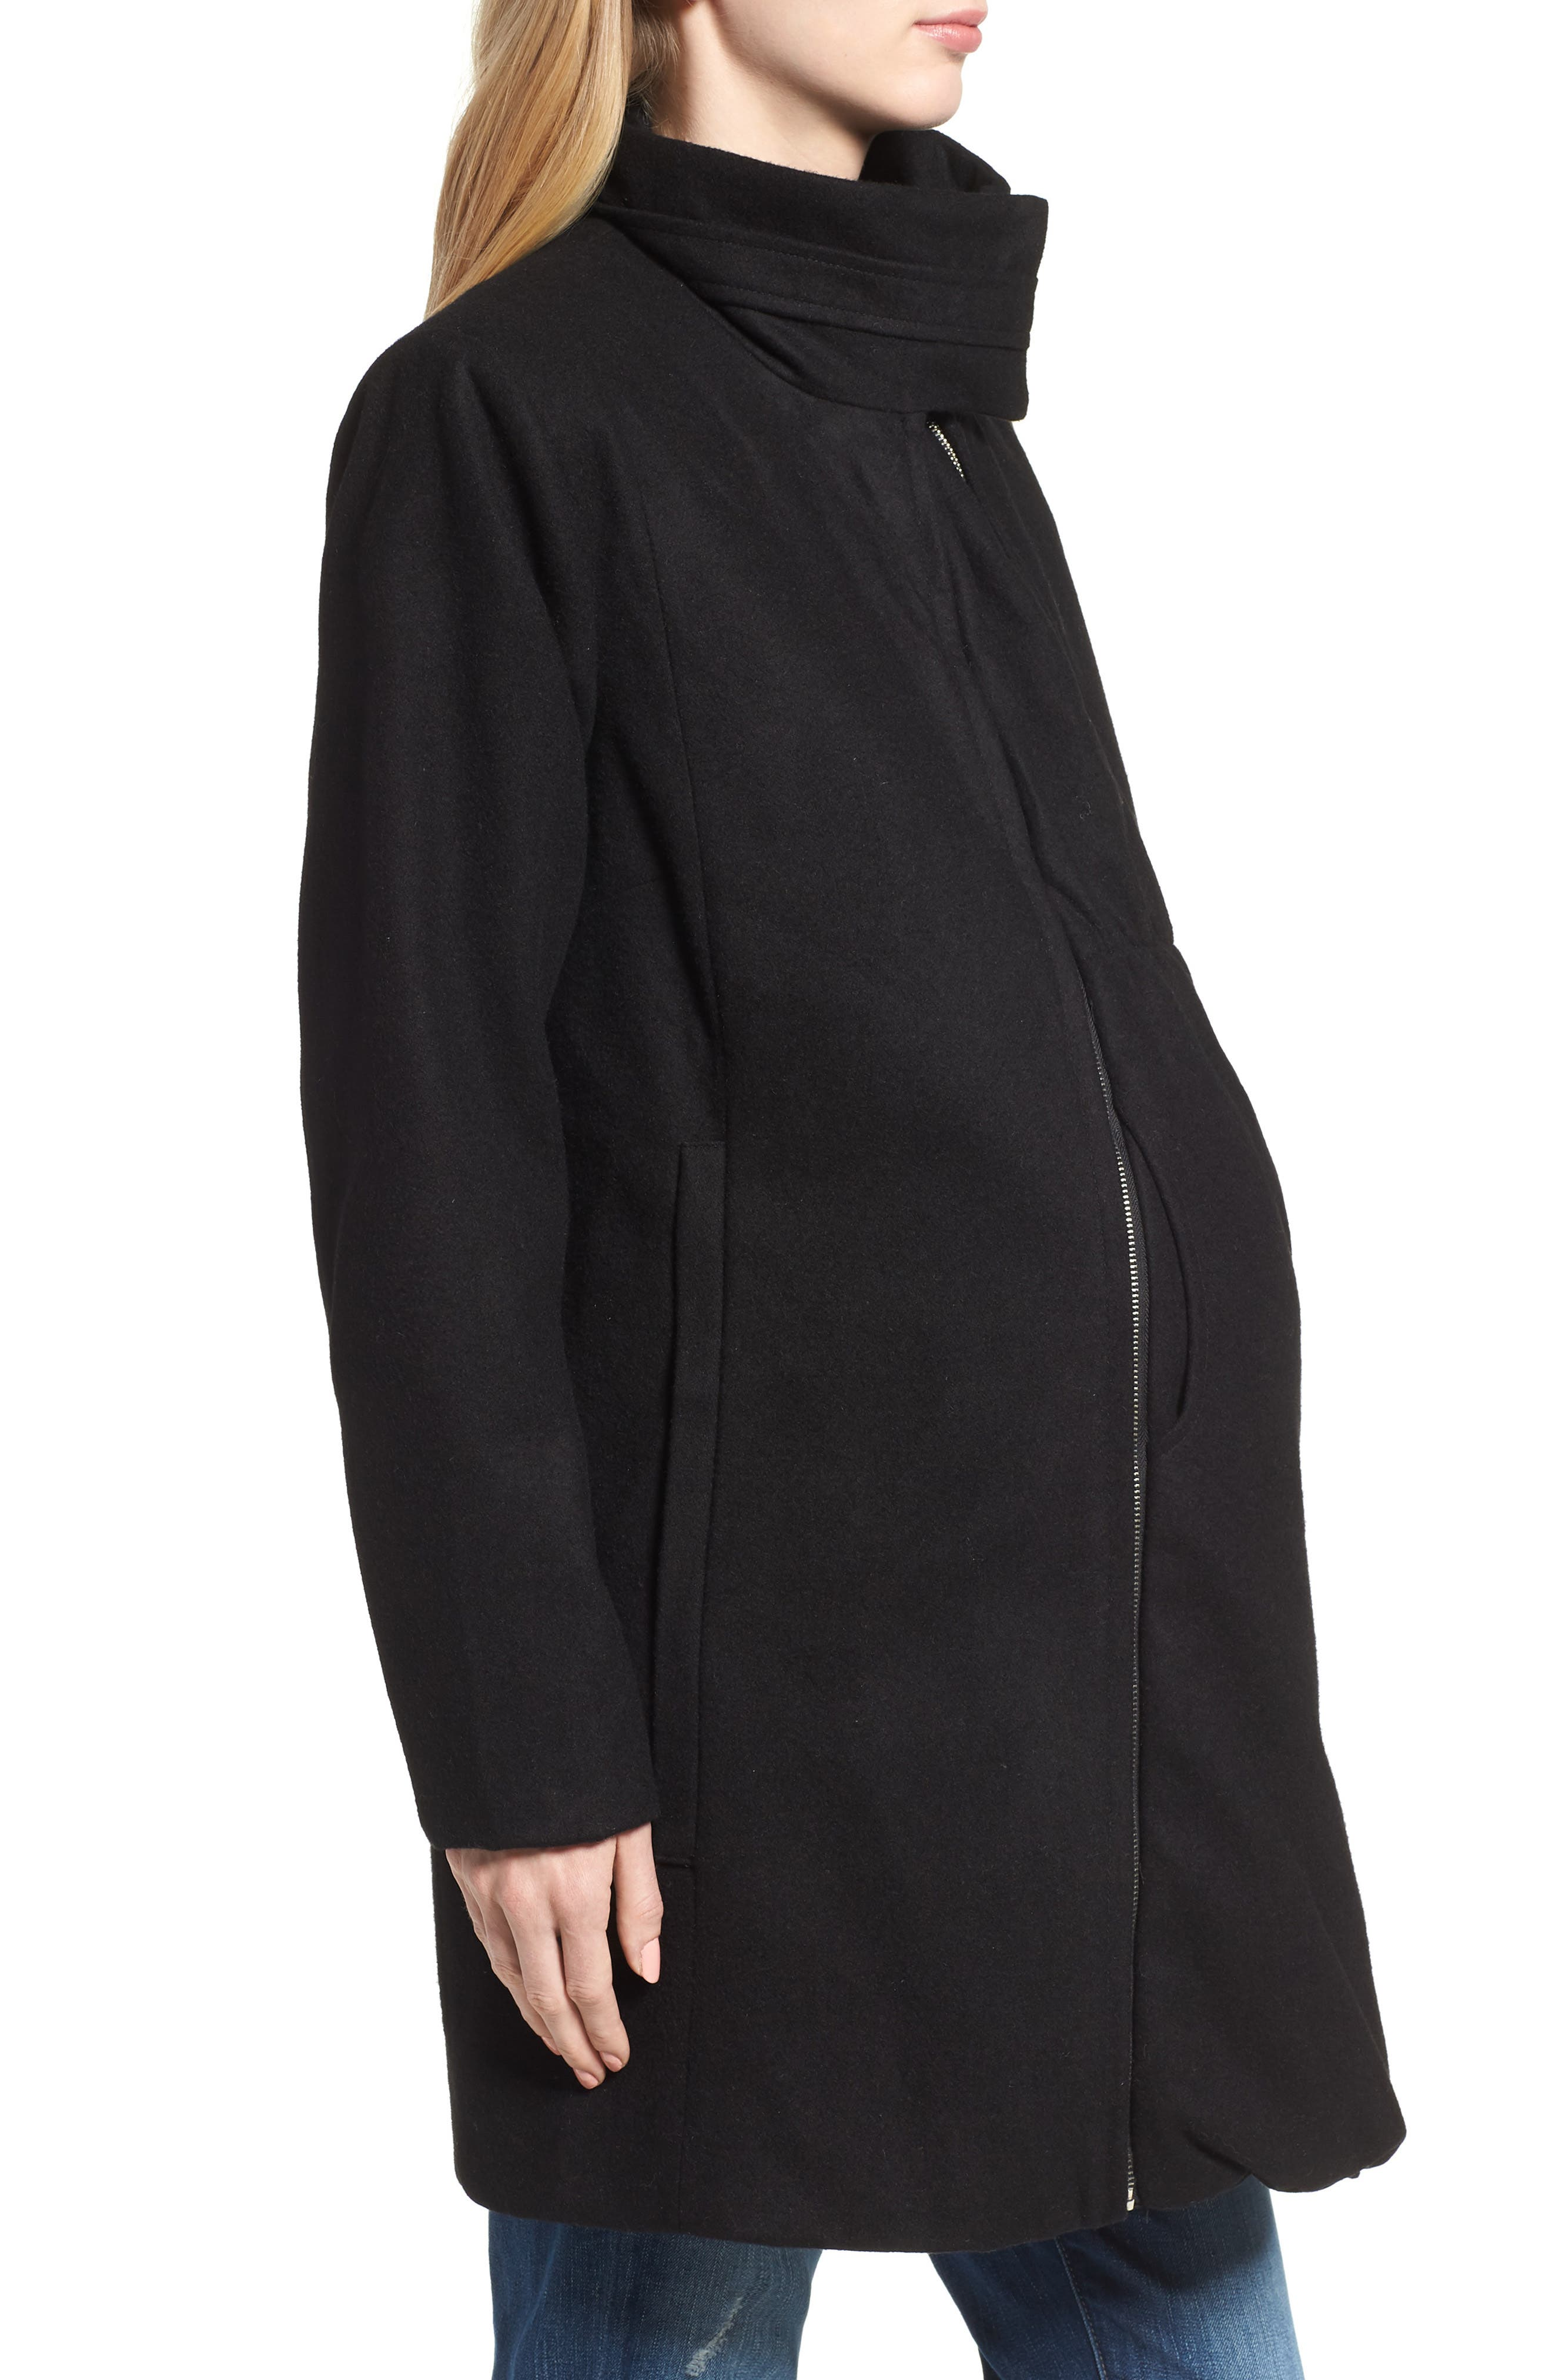 MODERN ETERNITY, Convertible 3-in-1 Maternity/Nursing Coat, Alternate thumbnail 4, color, BLACK